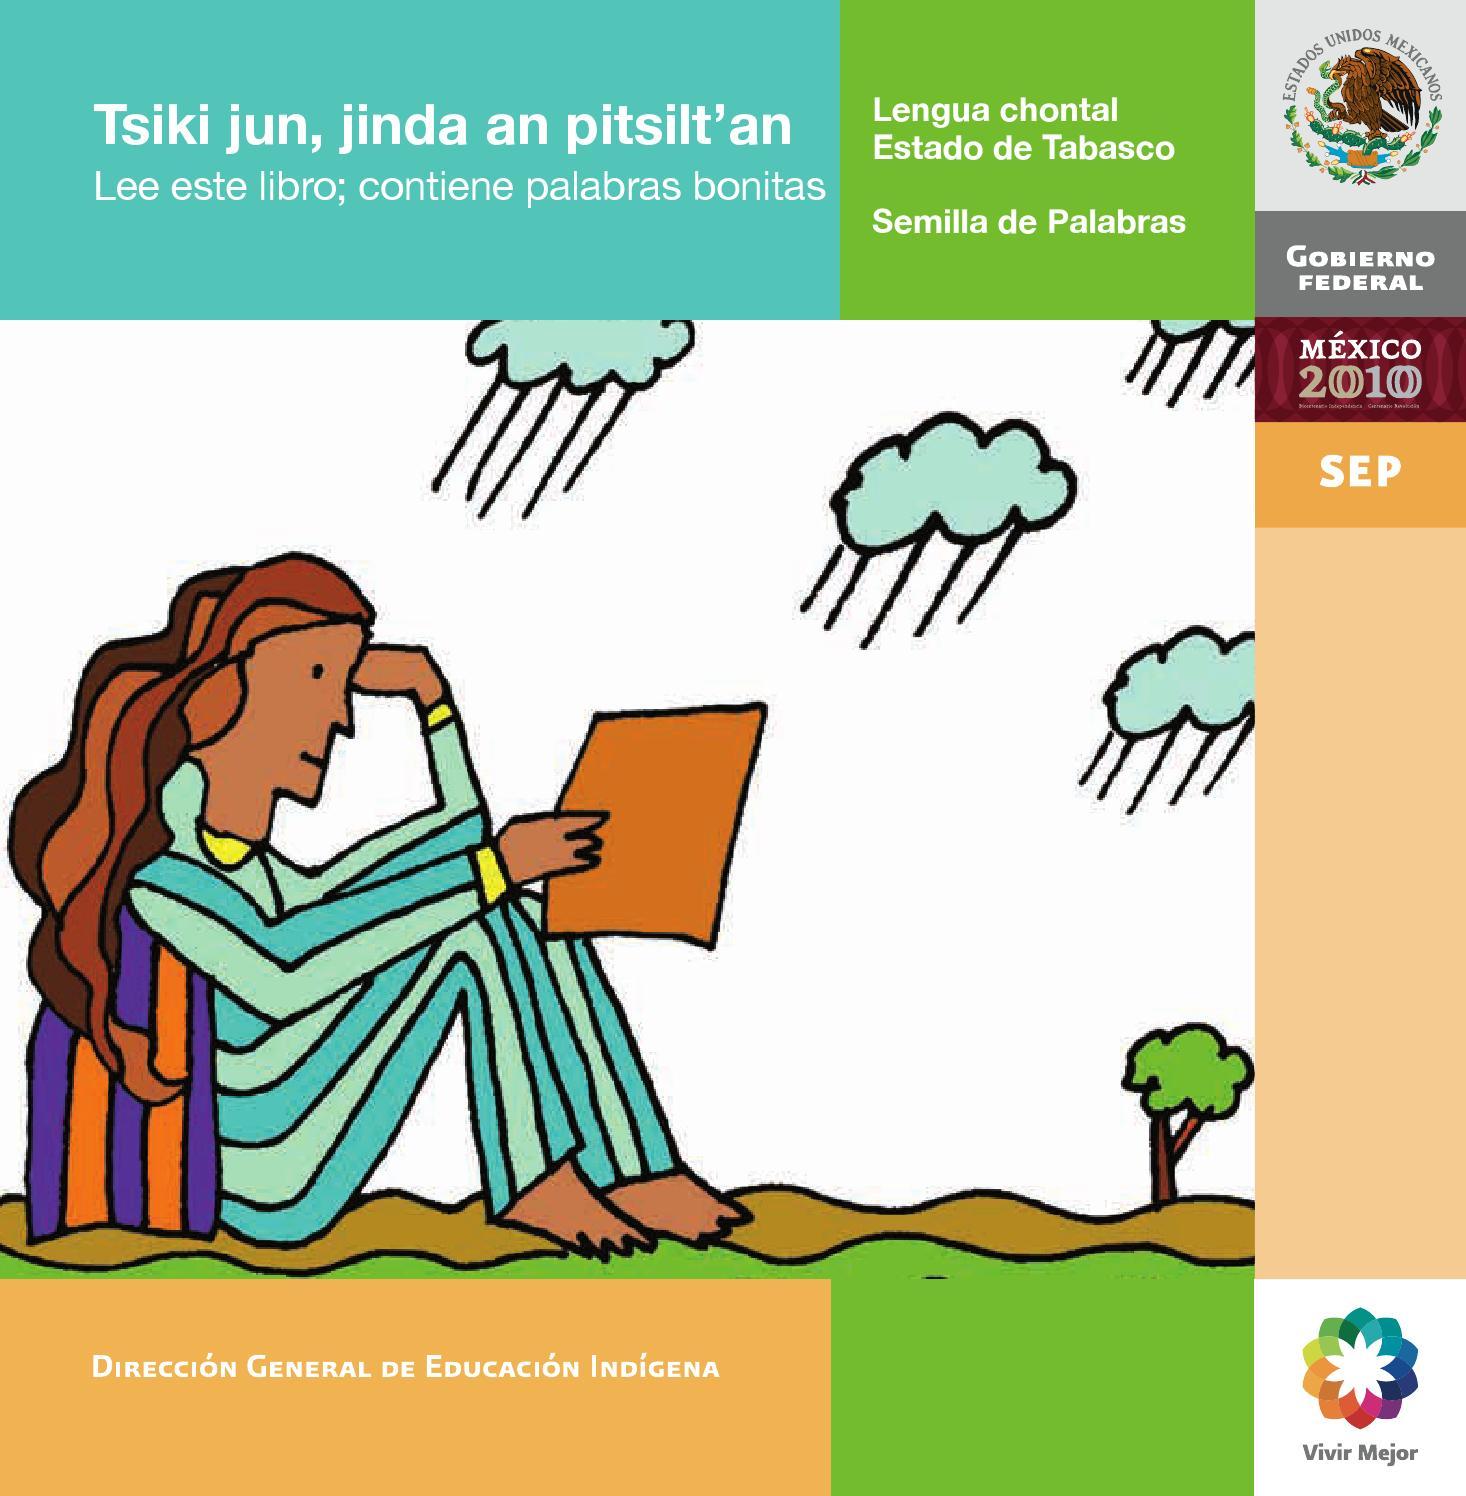 Lee este libro; contiene palabras bonitas tsiki jun, jinda